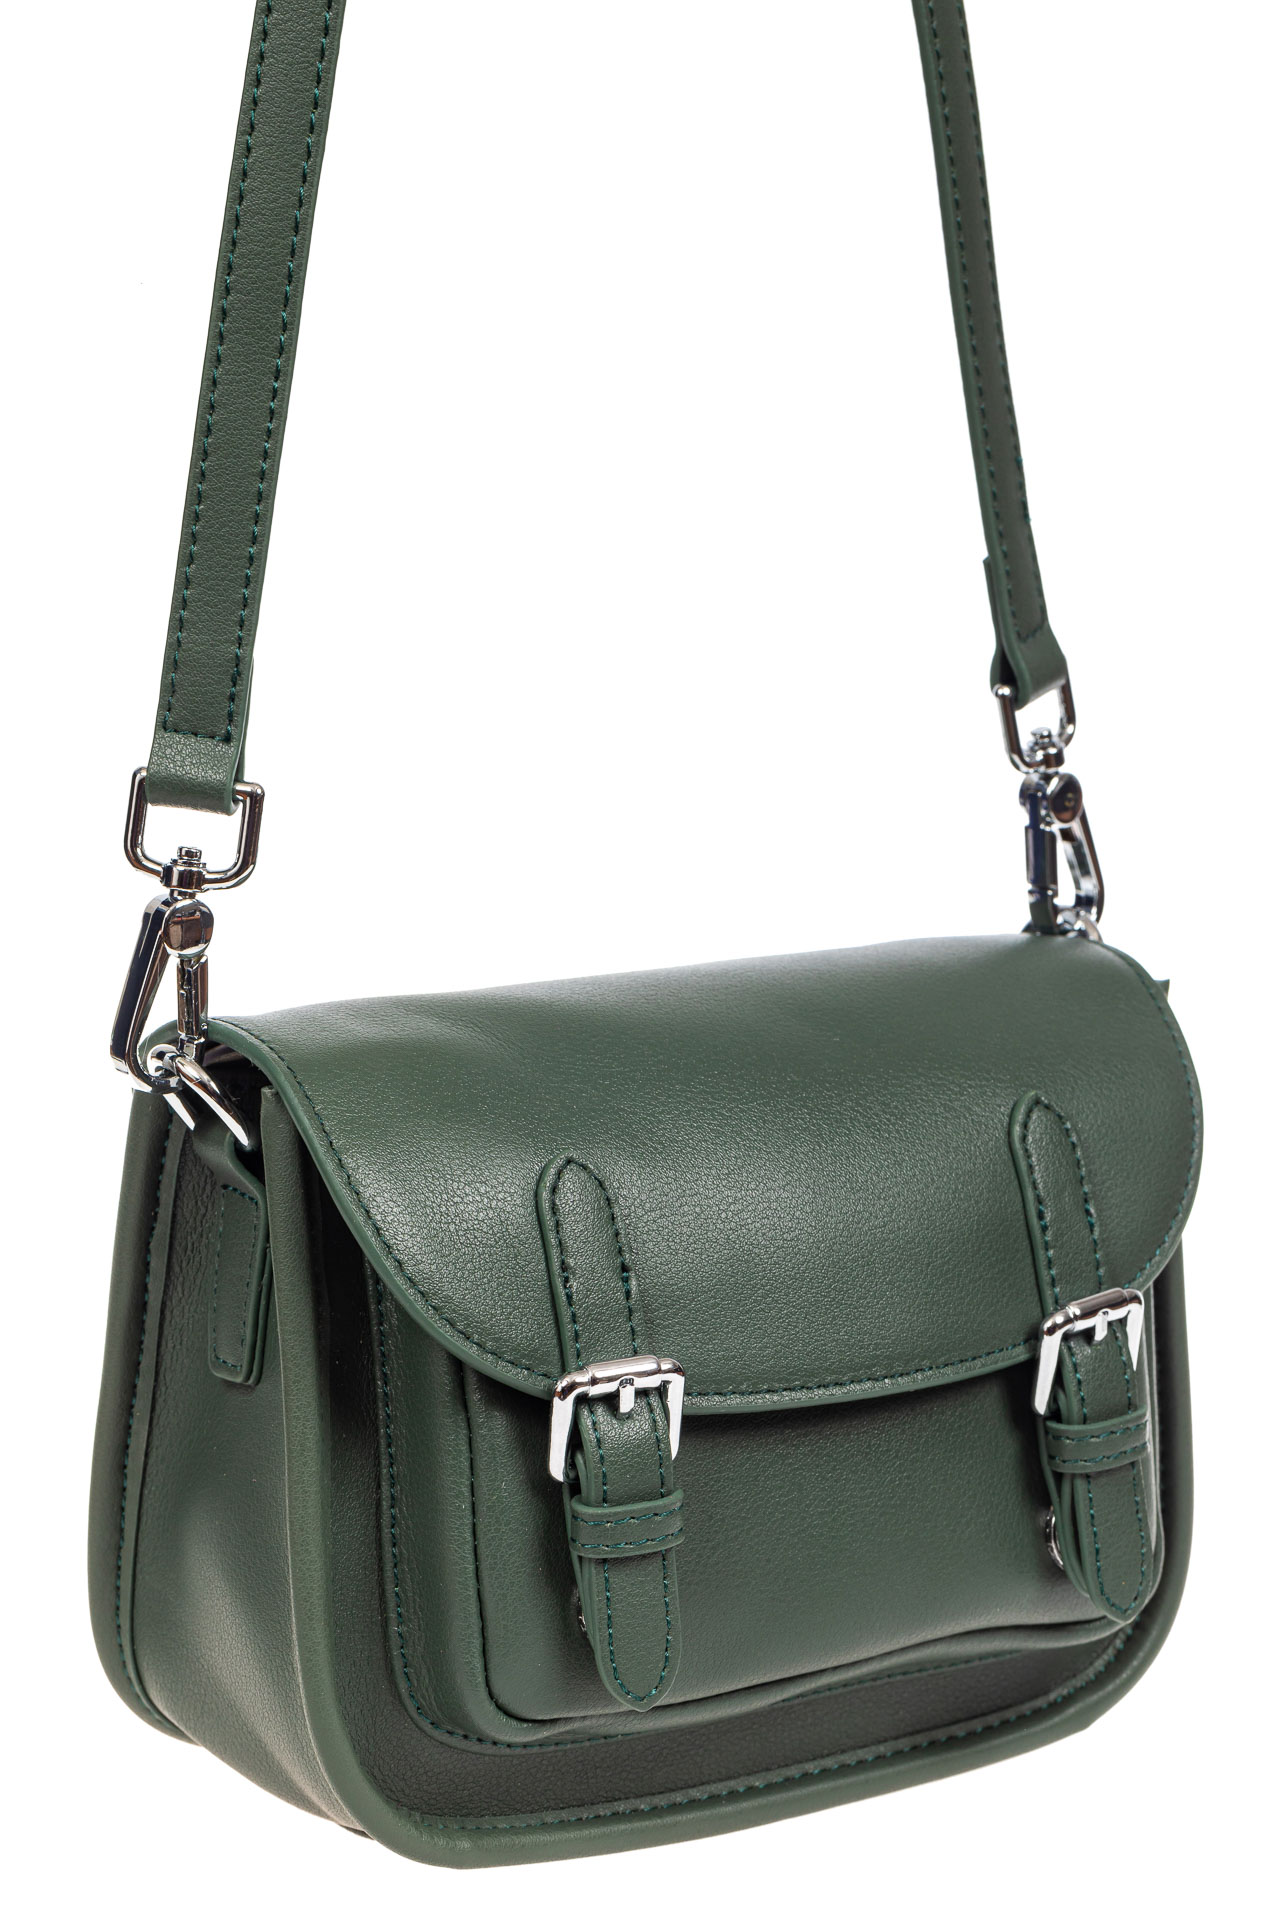 Кожаная сумка Saddle Bag, цвет зеленый9682NK0420/7